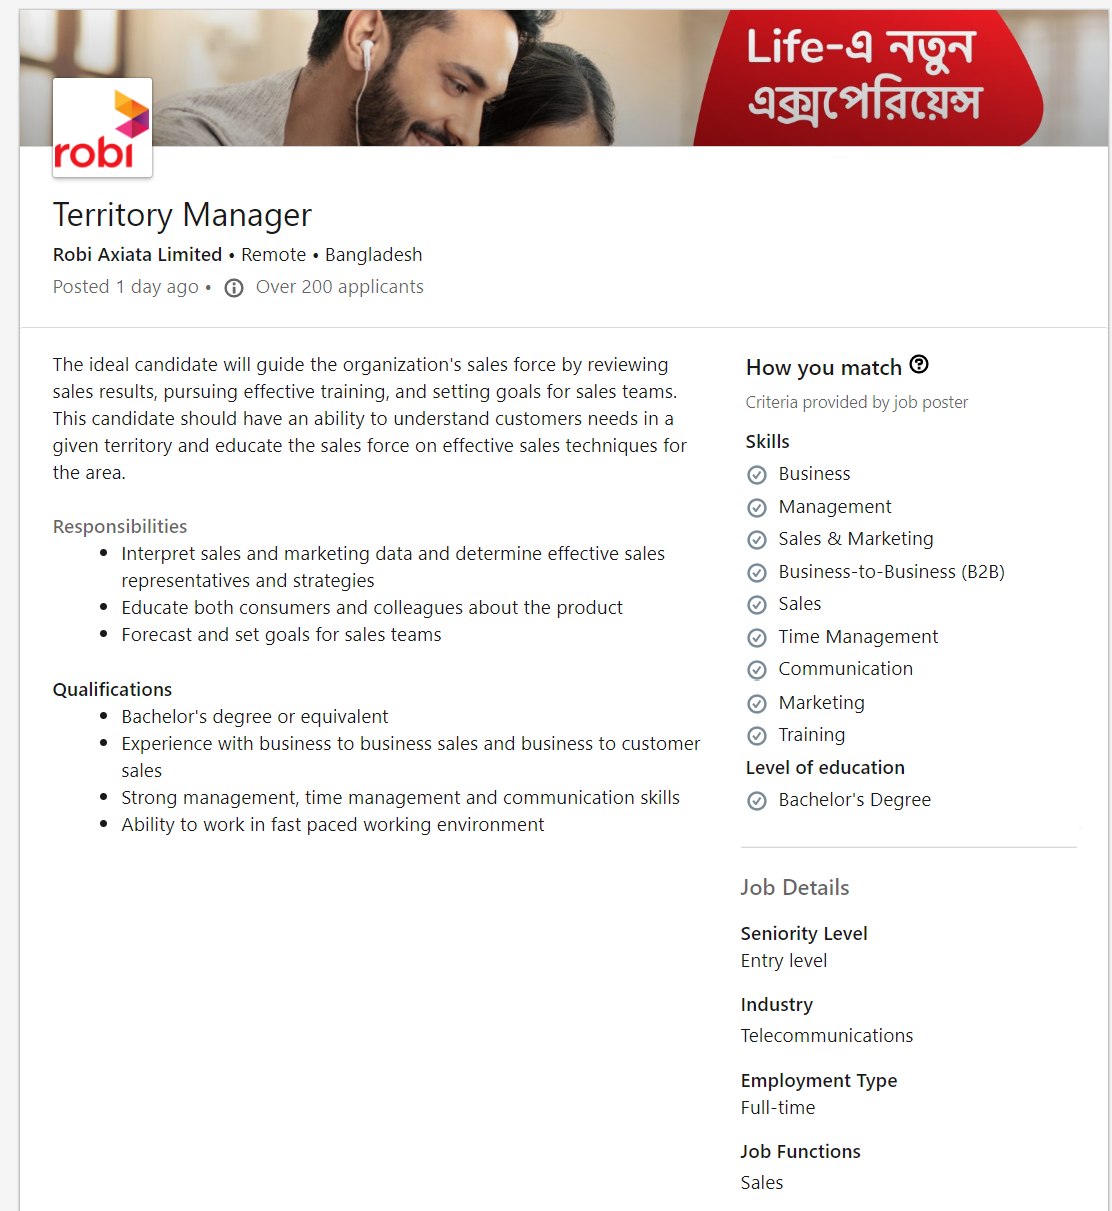 Robi Axiata Limited job circular 2020